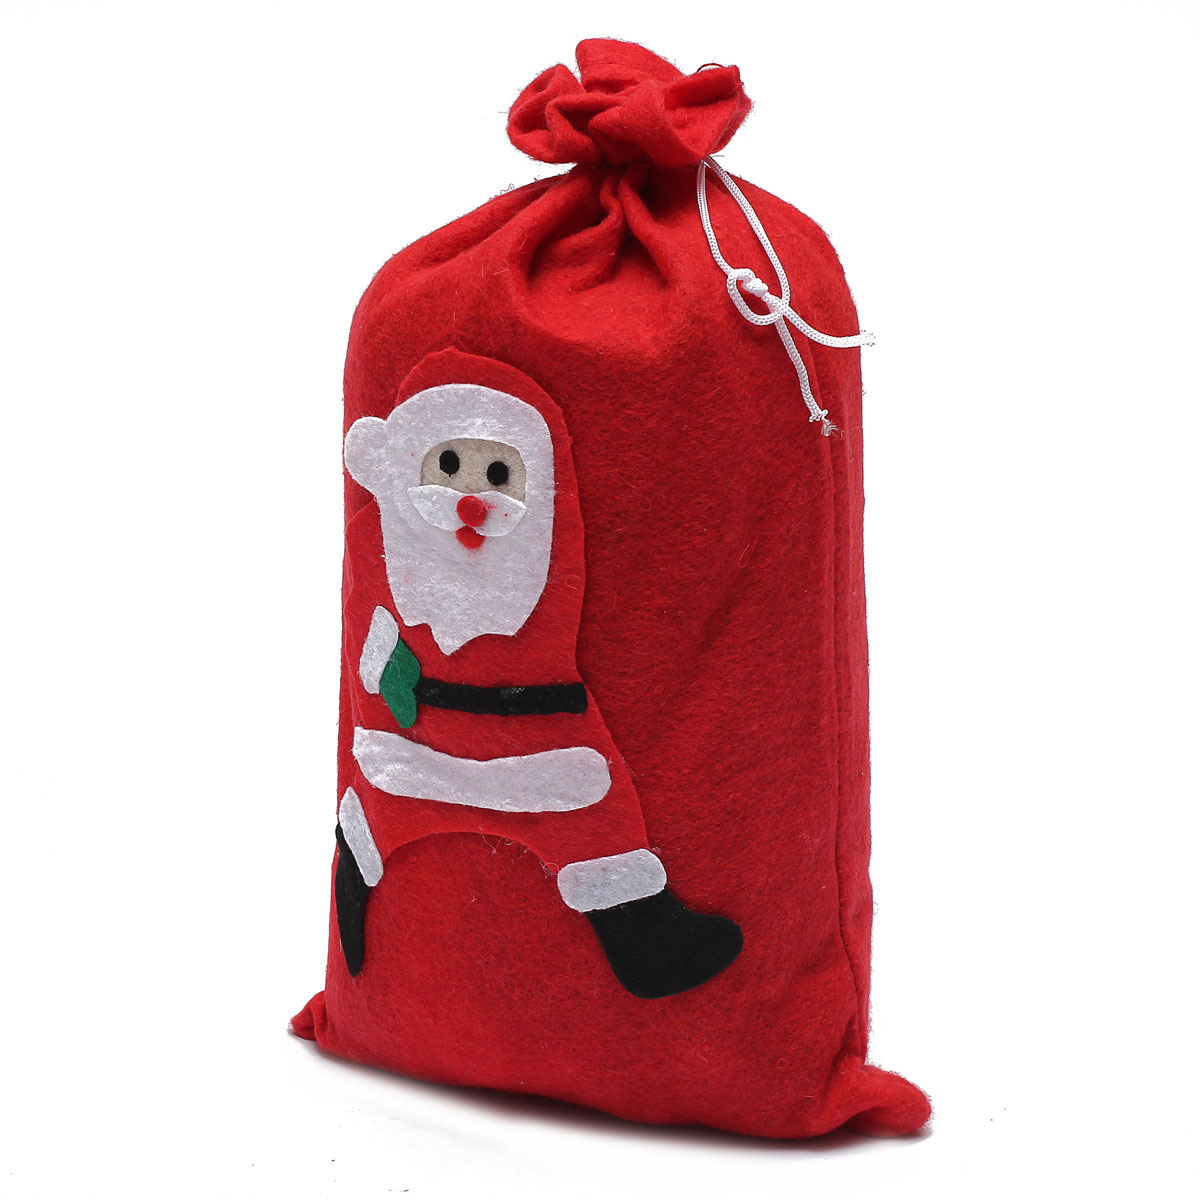 red large santa claus gift sack bag christmas costume accessory random style ebay. Black Bedroom Furniture Sets. Home Design Ideas